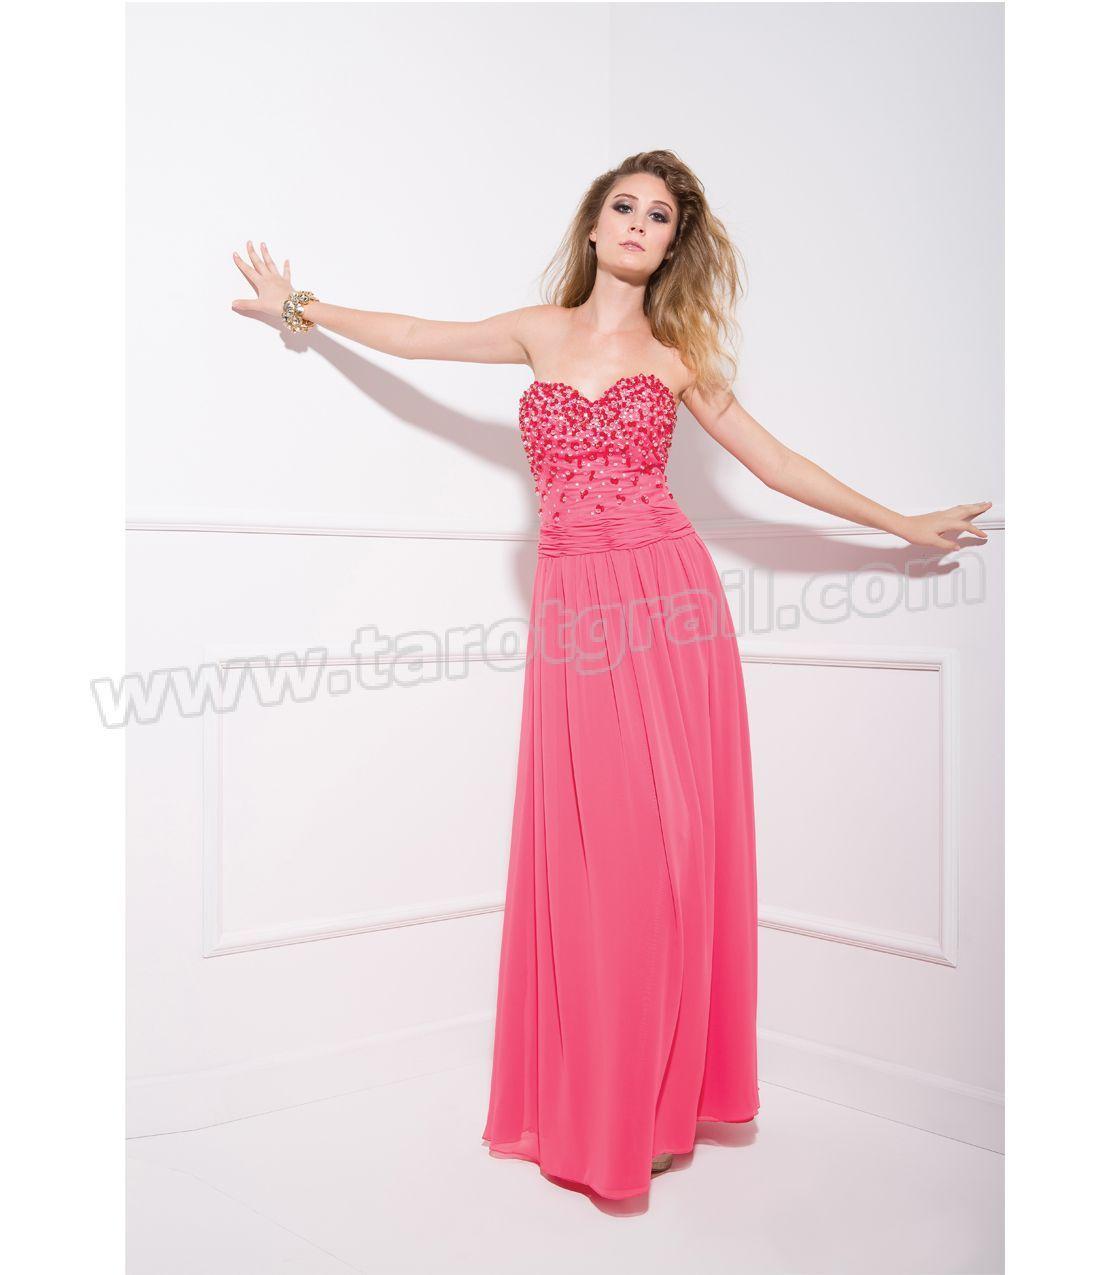 Watermelon Beaded Chiffon Prom Dress | Long Prom Dresses | Pinterest